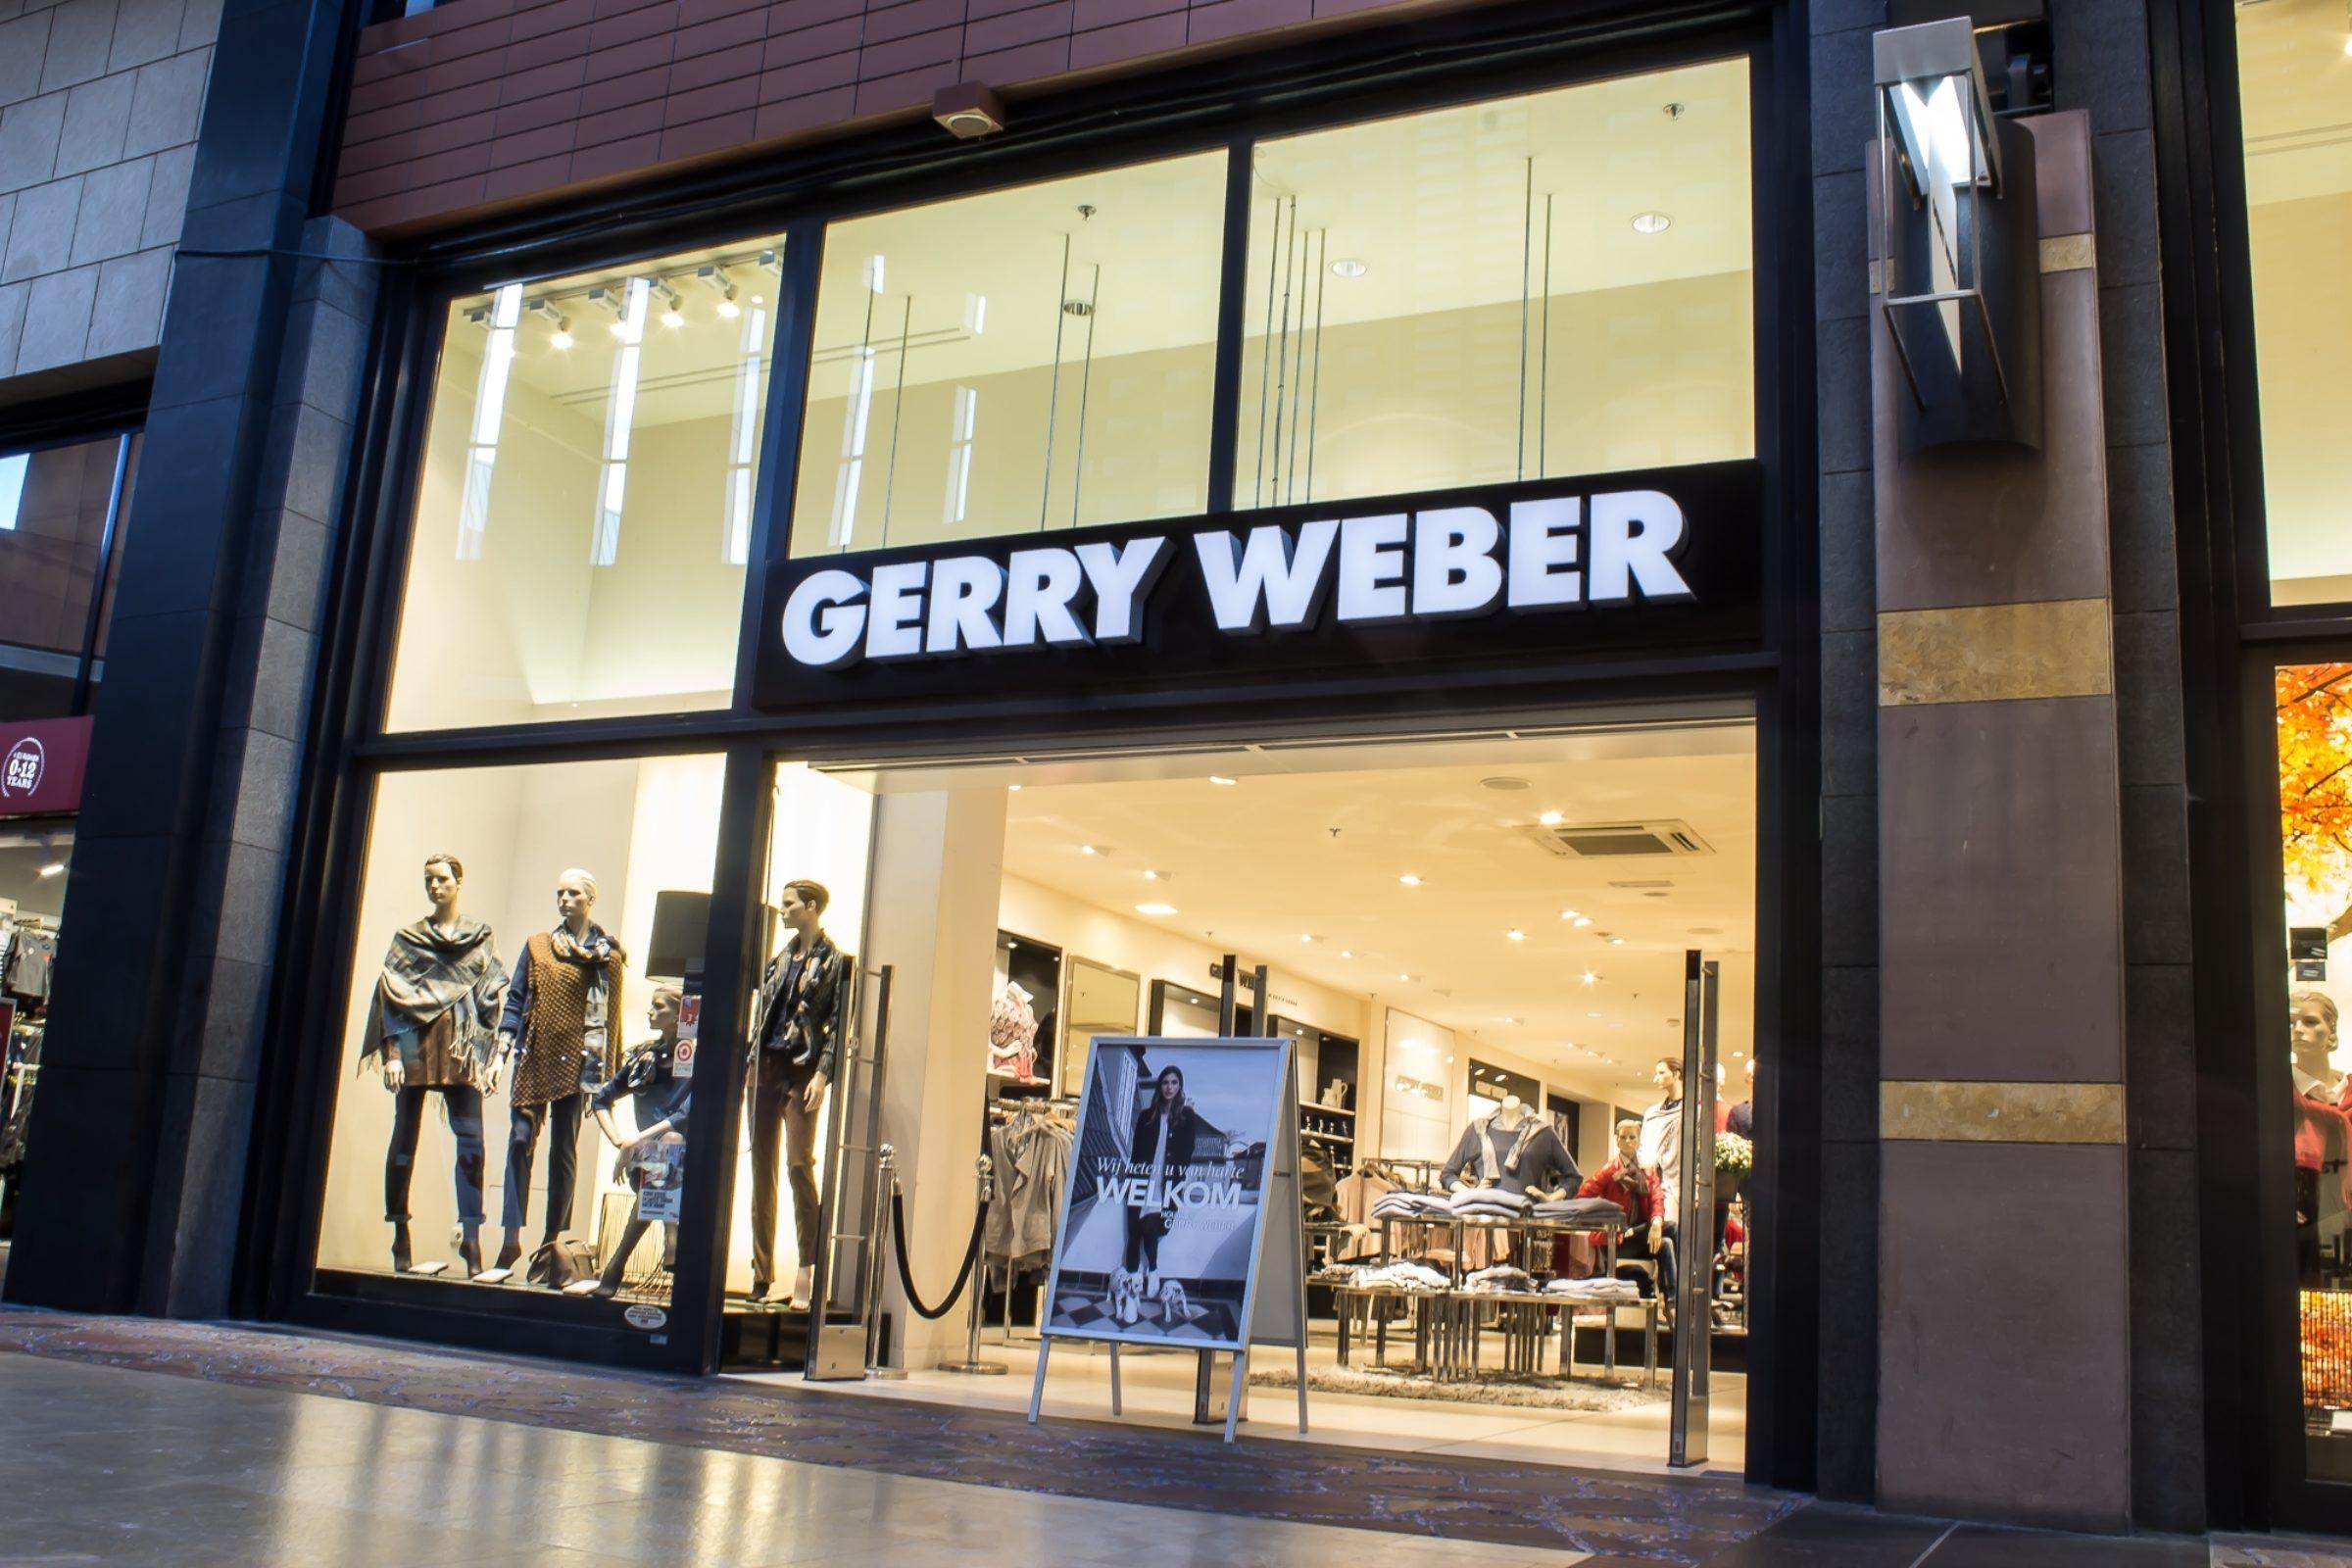 gerry weber enschede